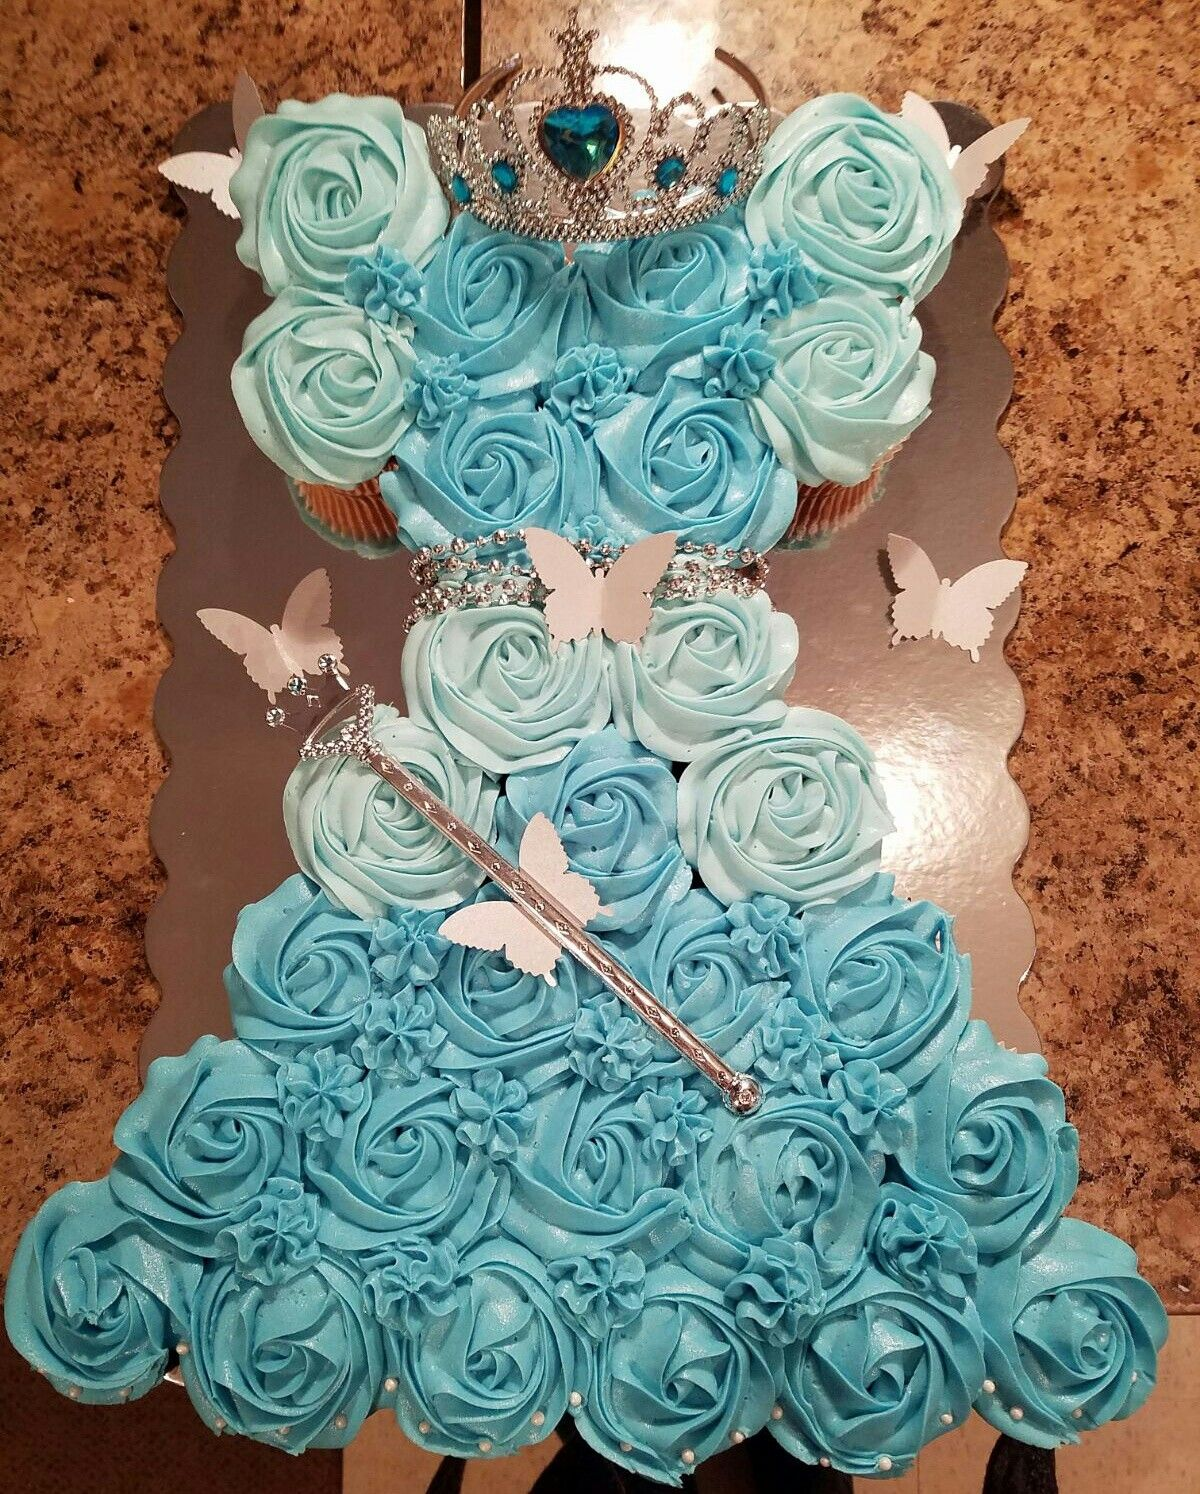 Phenomenal Cinderella Dress Pull Apart Cupcake Cake With Images Funny Birthday Cards Online Inifodamsfinfo